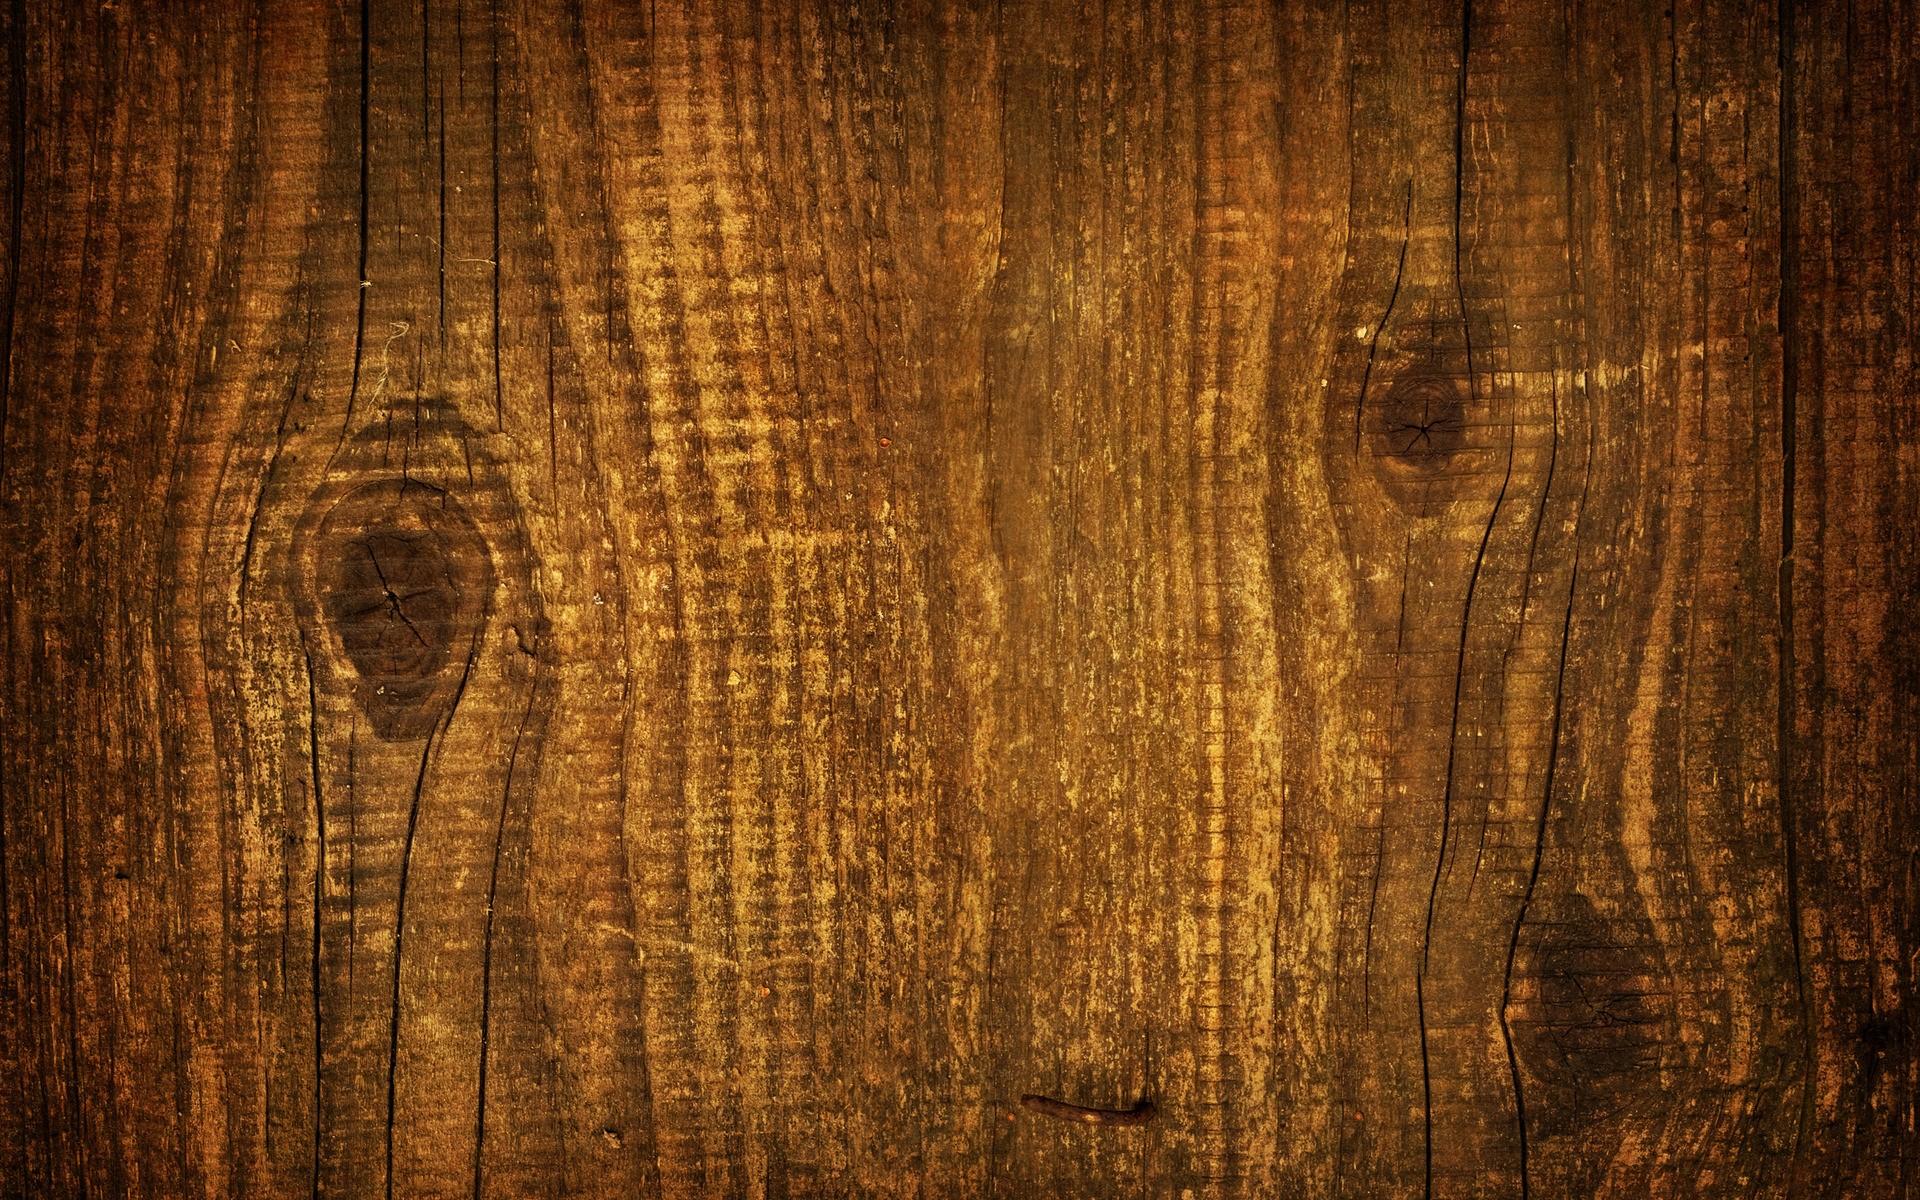 Textura de madera cortada - 1920x1200